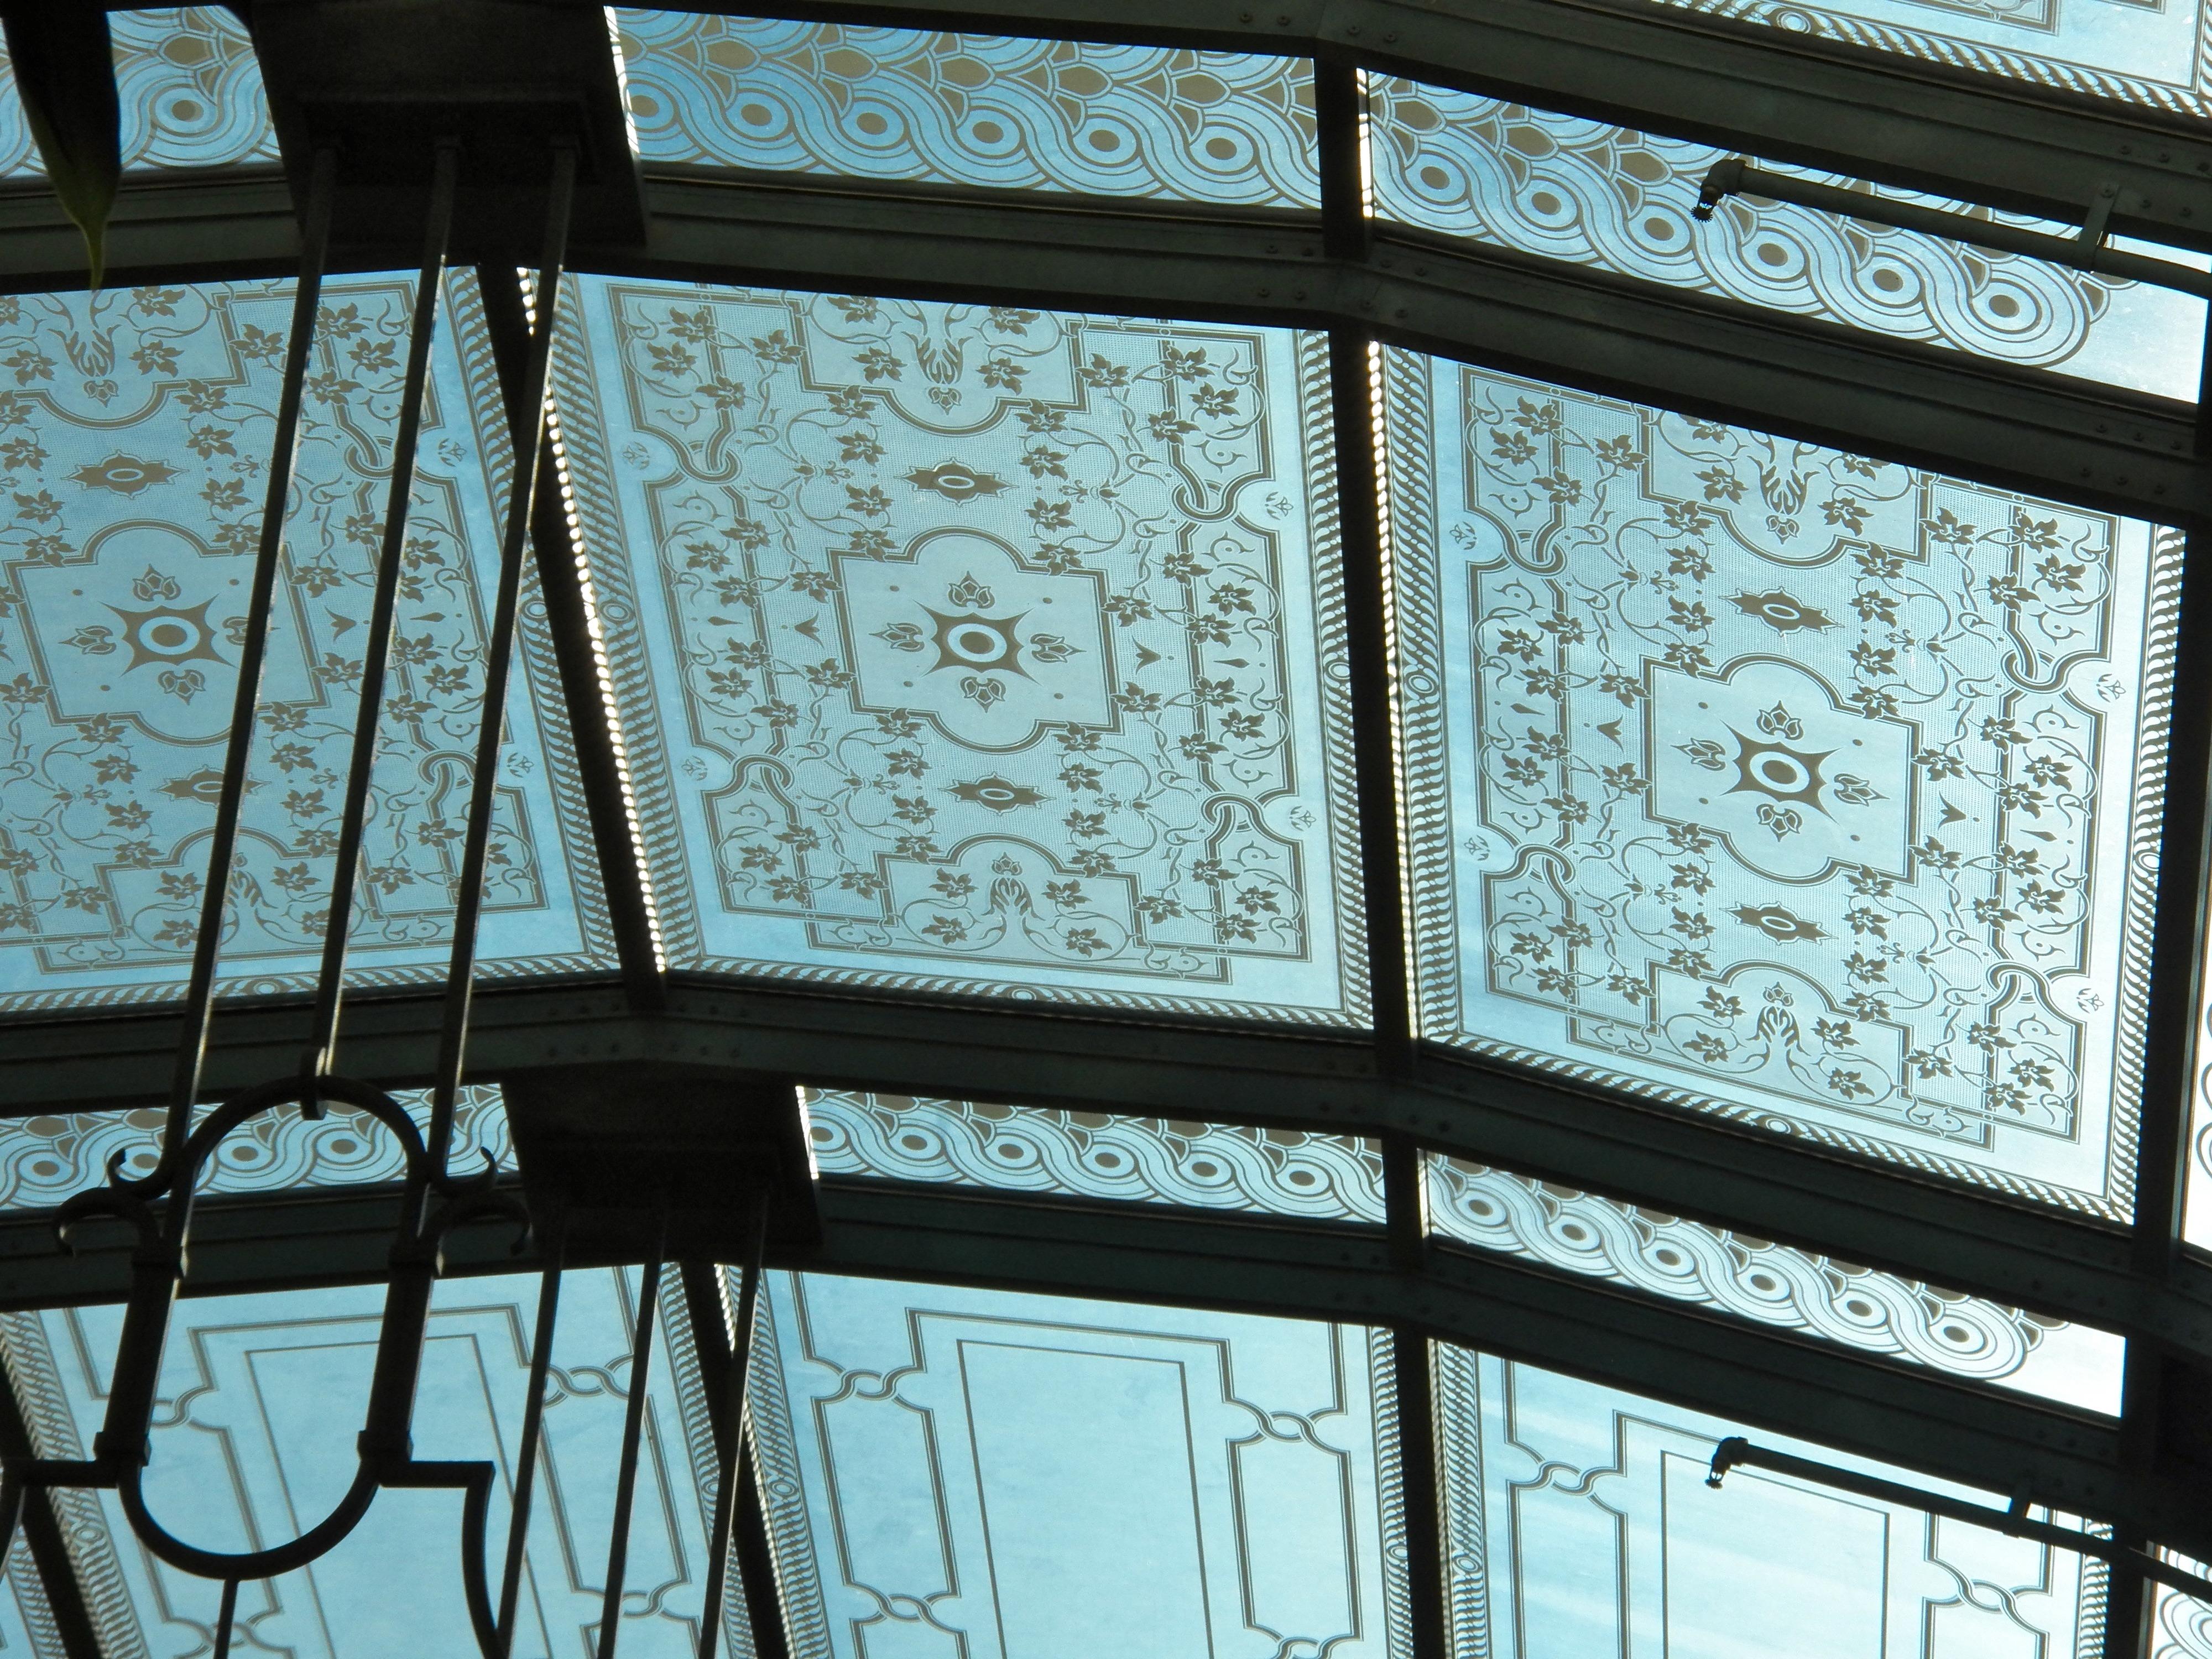 Transom Windows A Useful Design Element: Arquitectos De Interiores Famosos. Stunning Unidades De La